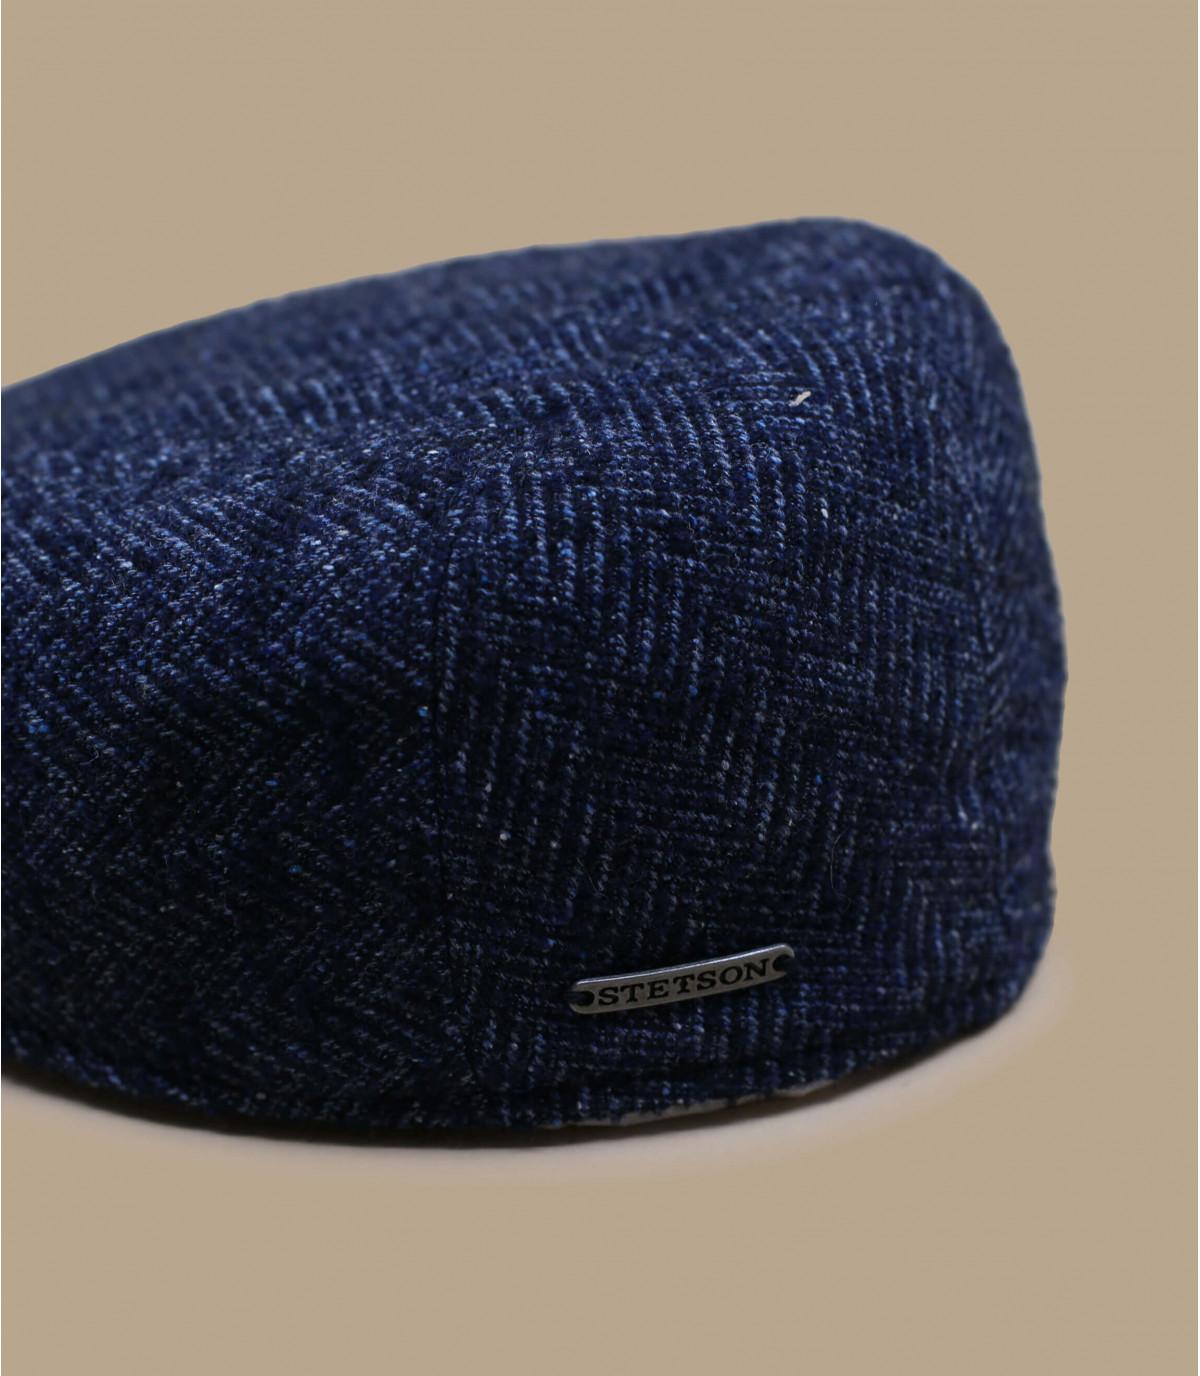 Details Ivy Cap Virgin Wool blue herringbone - Abbildung 2